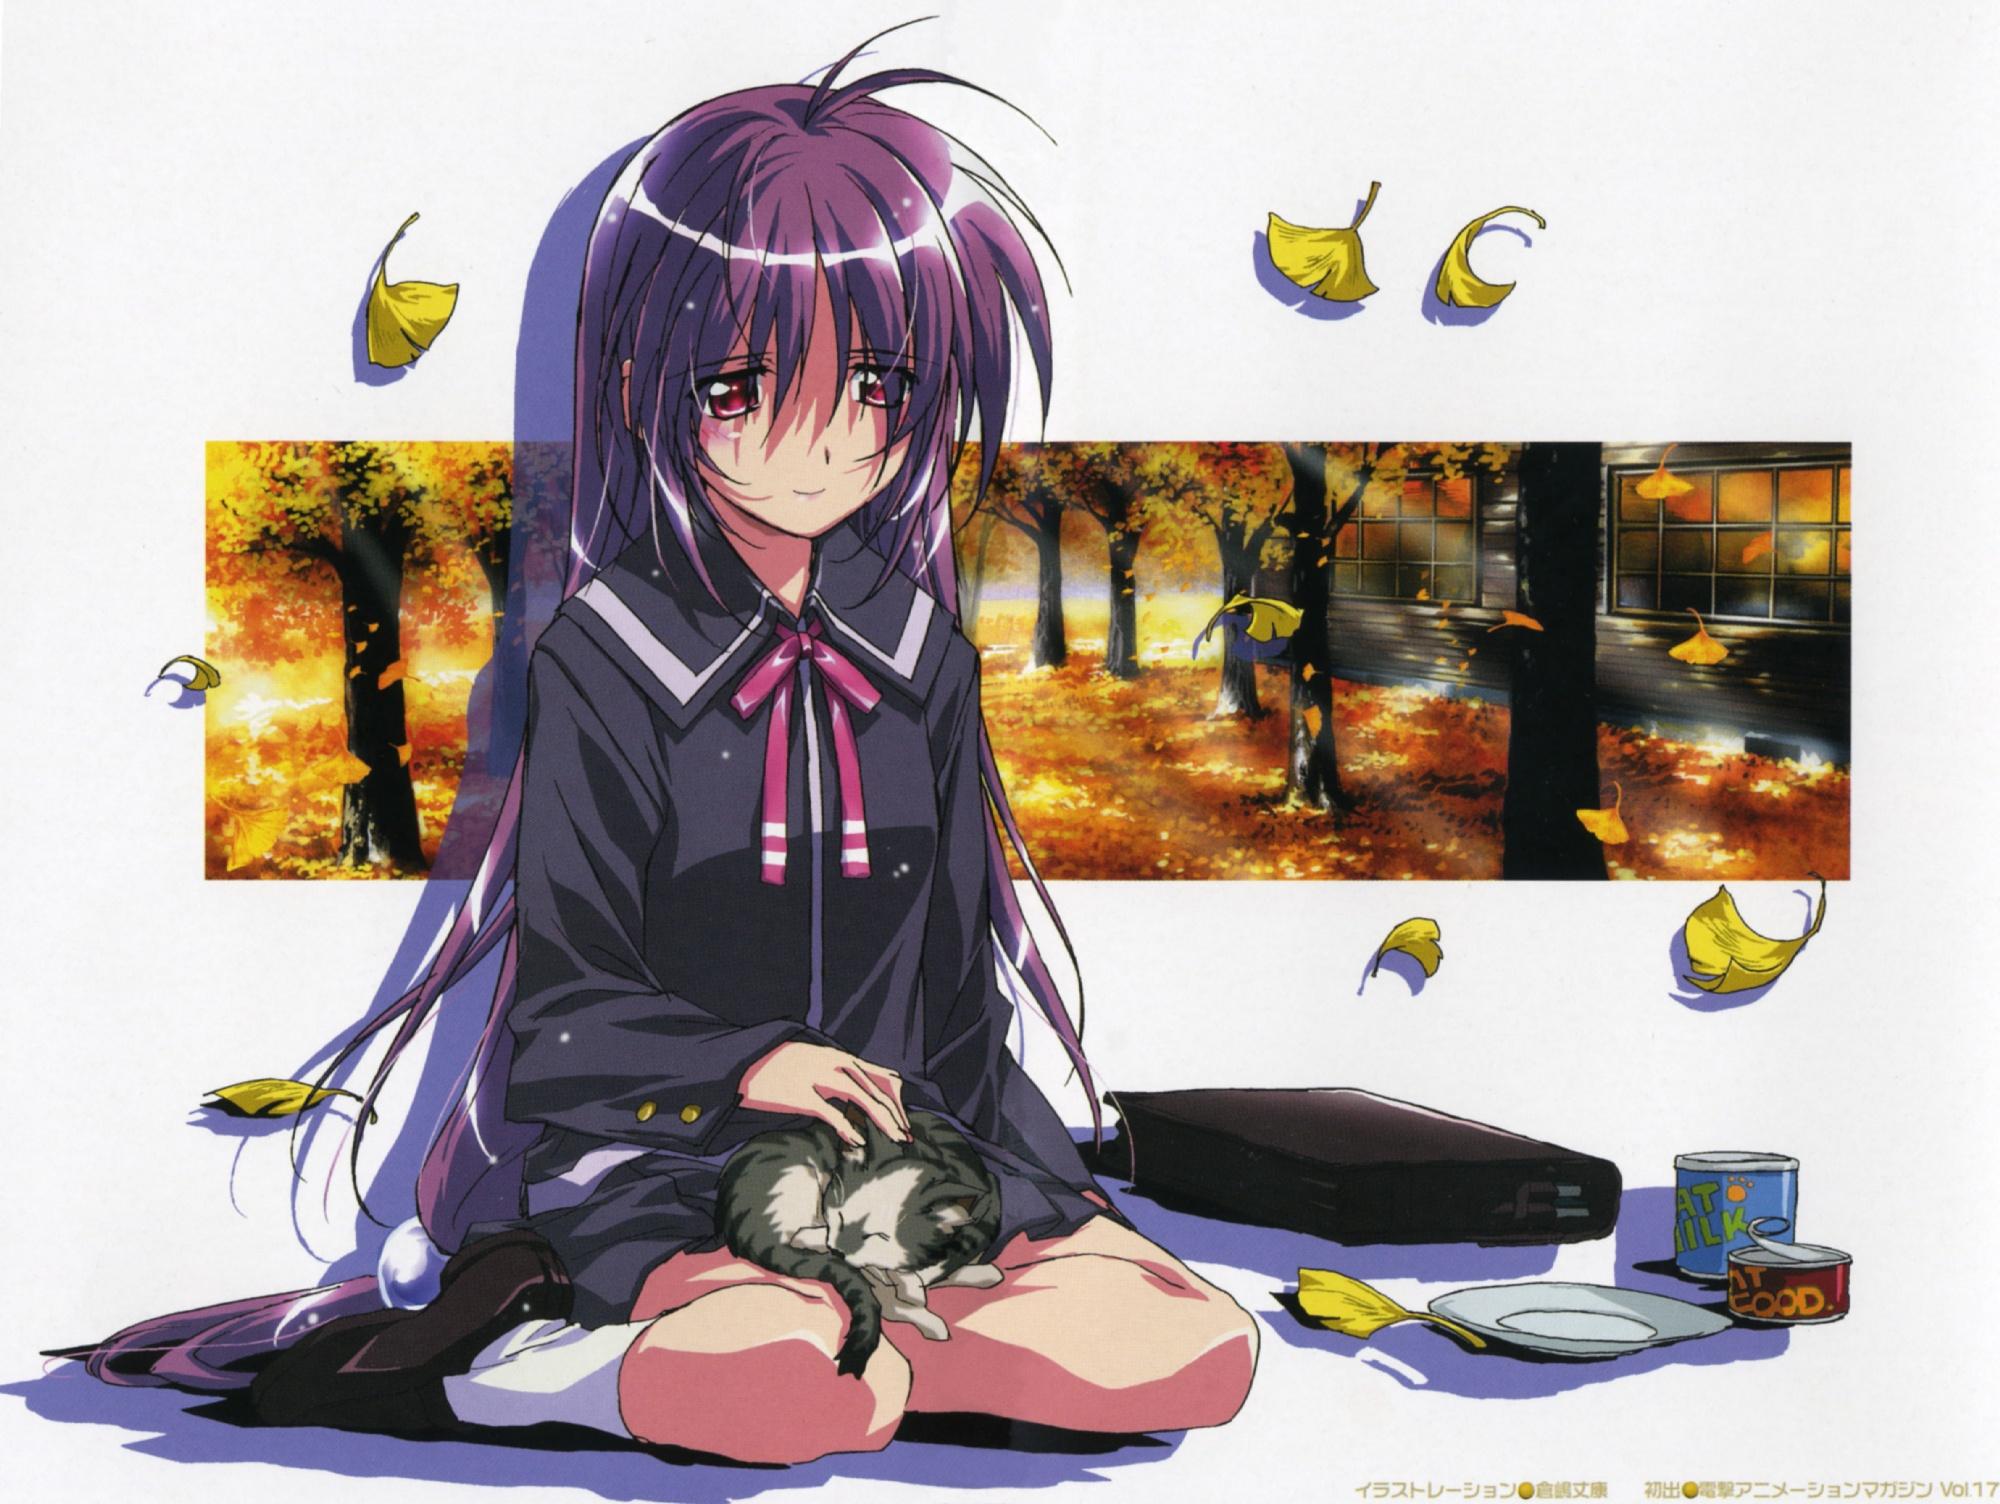 animal autumn cat food iriya_kana iriya_no_sora_ufo_no_natsu leaves long_hair purple_hair red_eyes school_uniform tree white